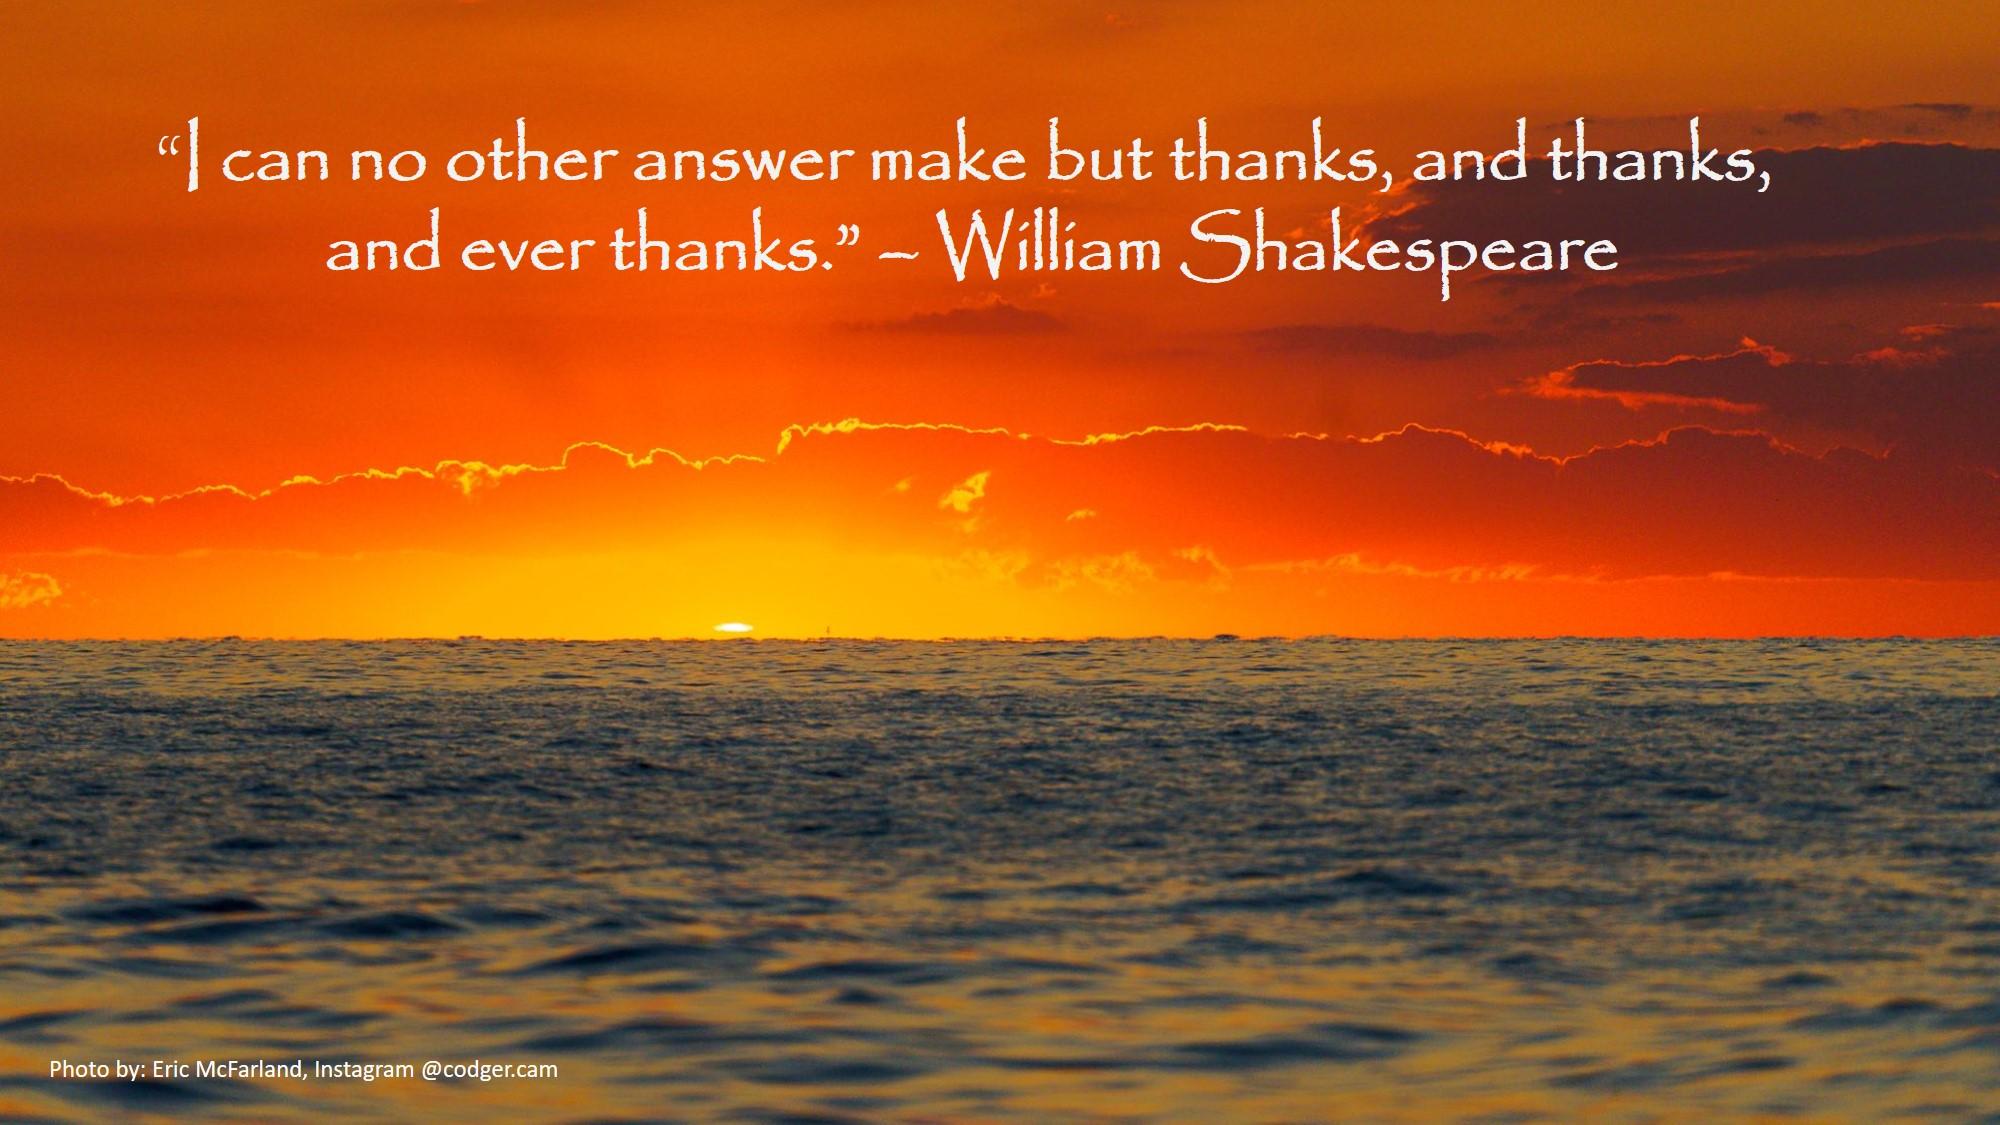 ERM Shakespeare